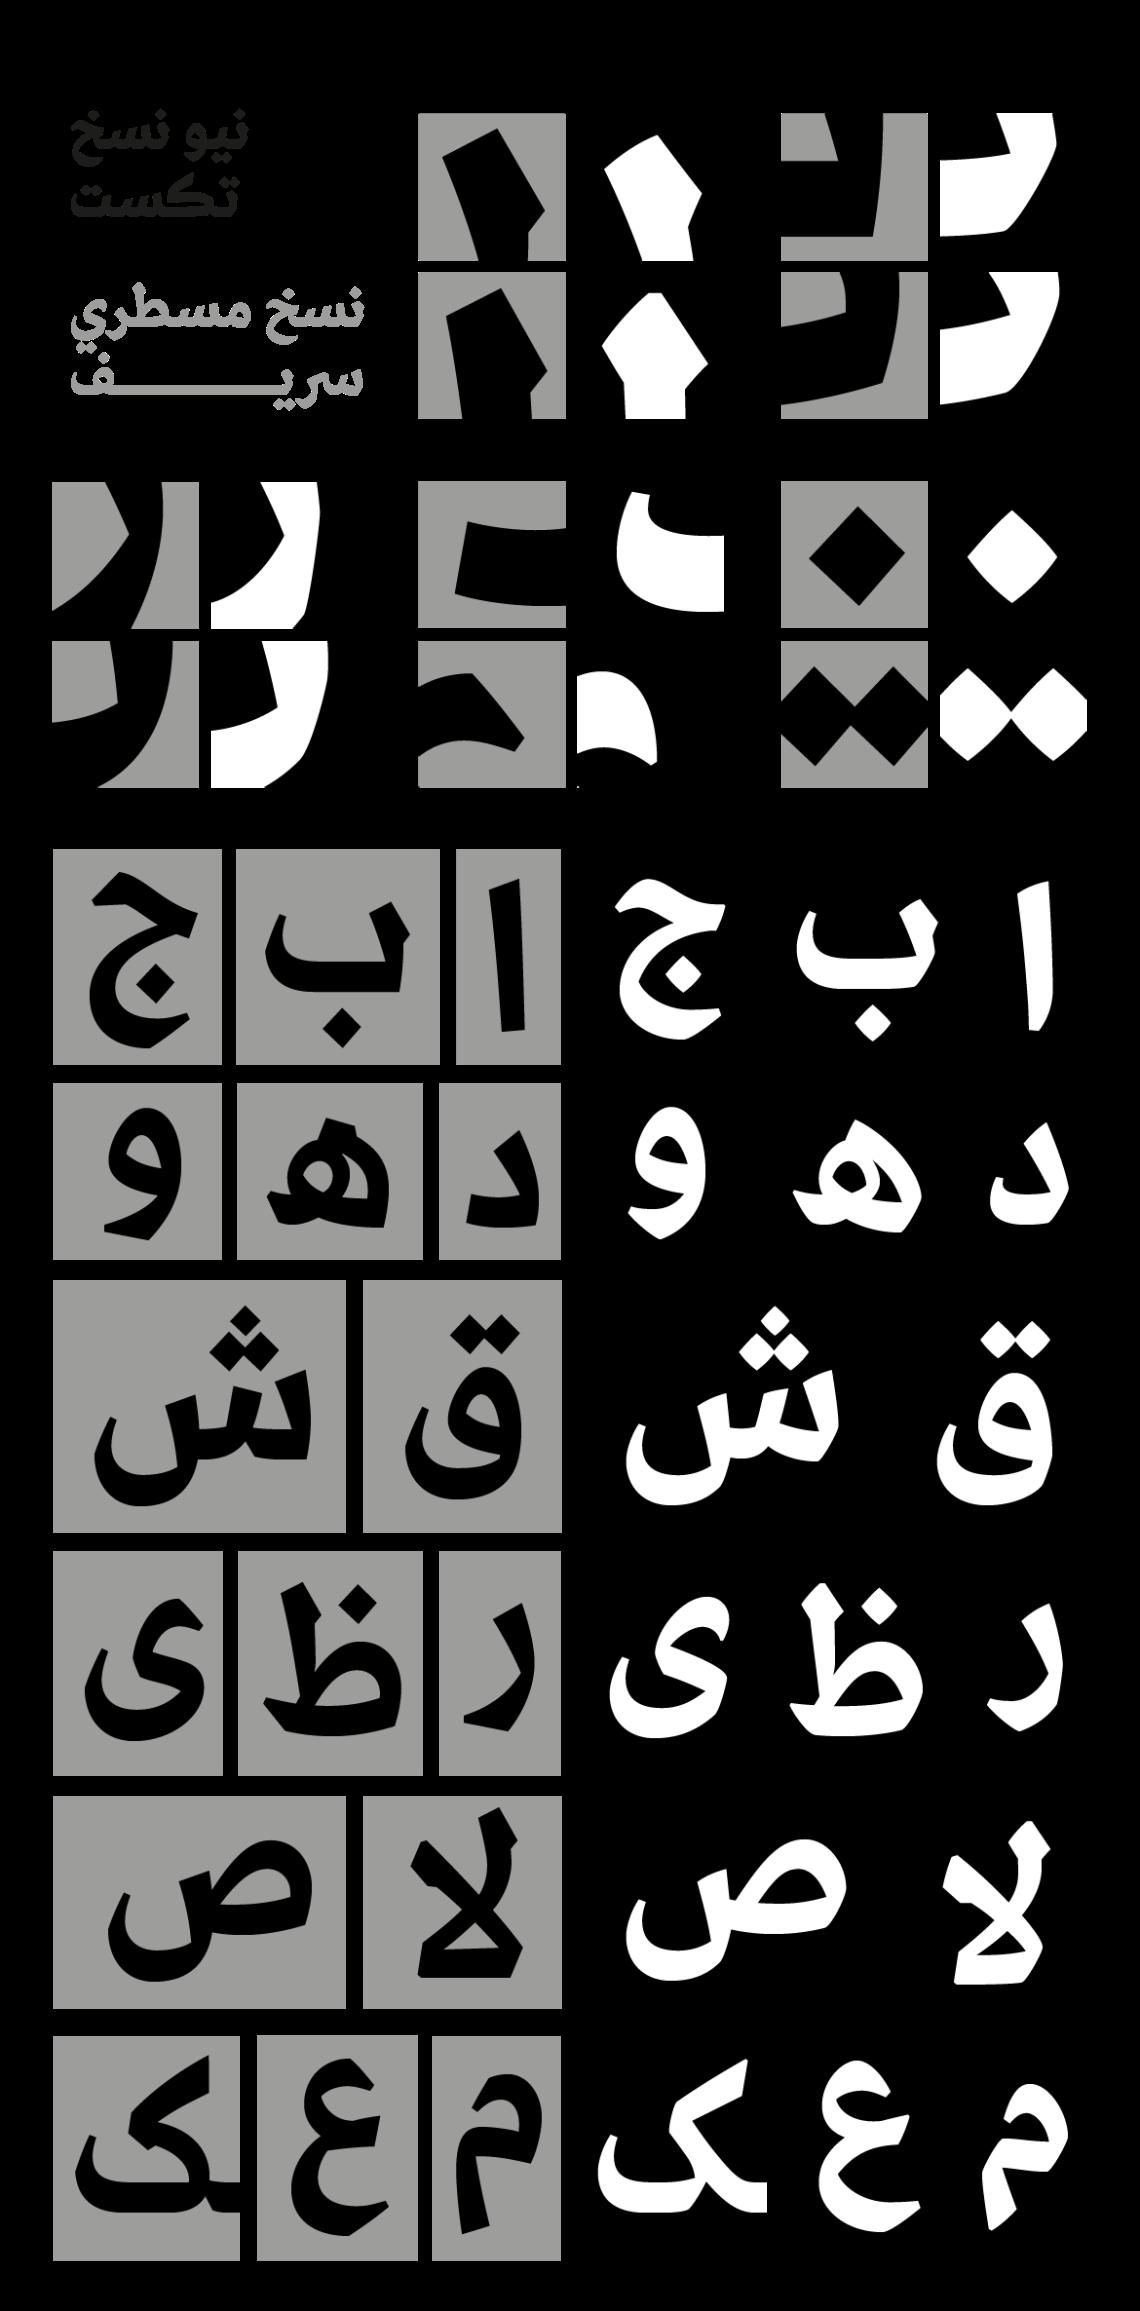 29LT-Zarid-Text-Image-17